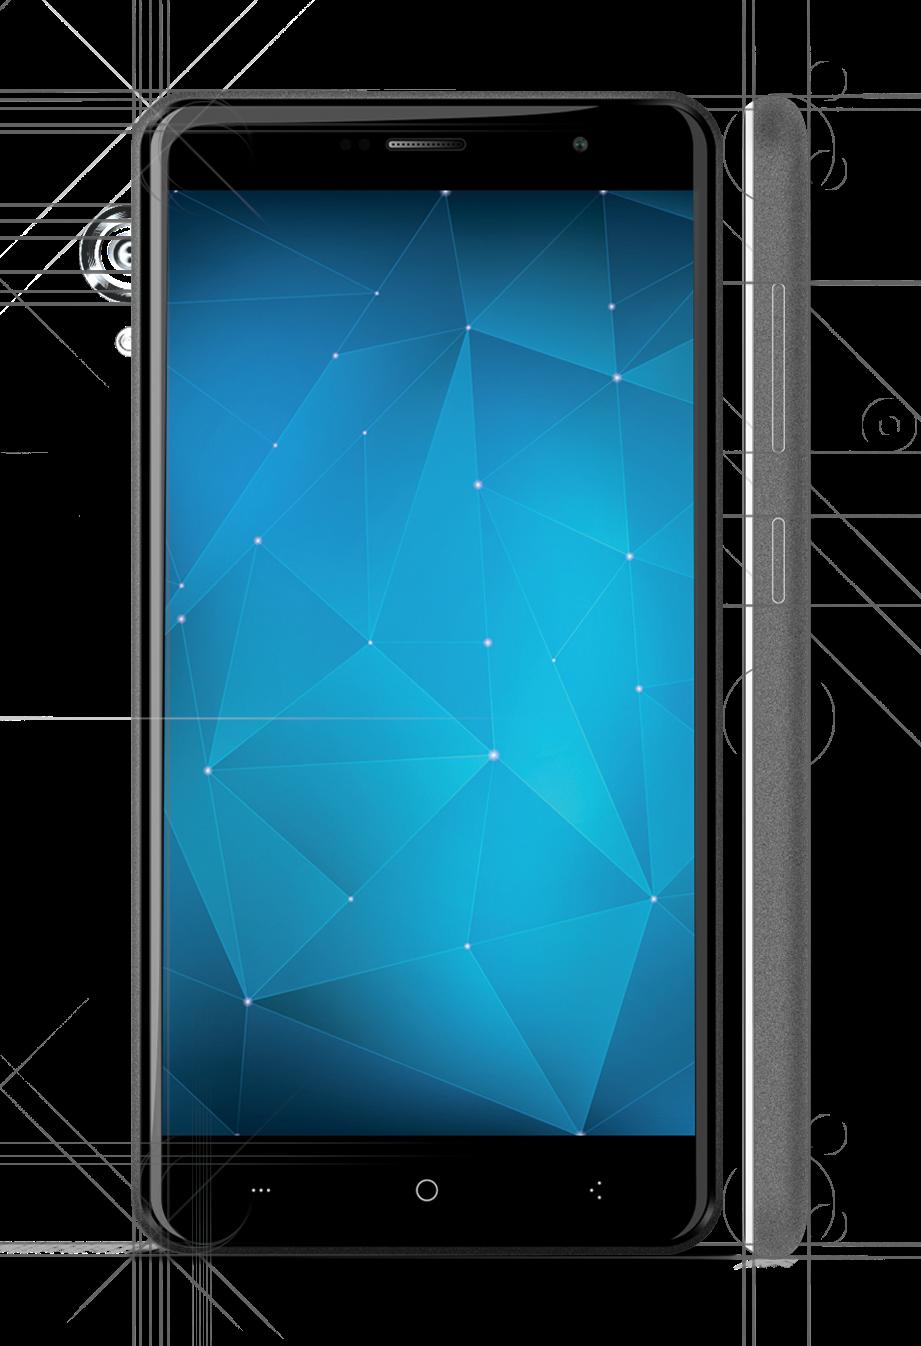 TELEFON DUAL SIM myPhone ARTIS ŠEDÝ